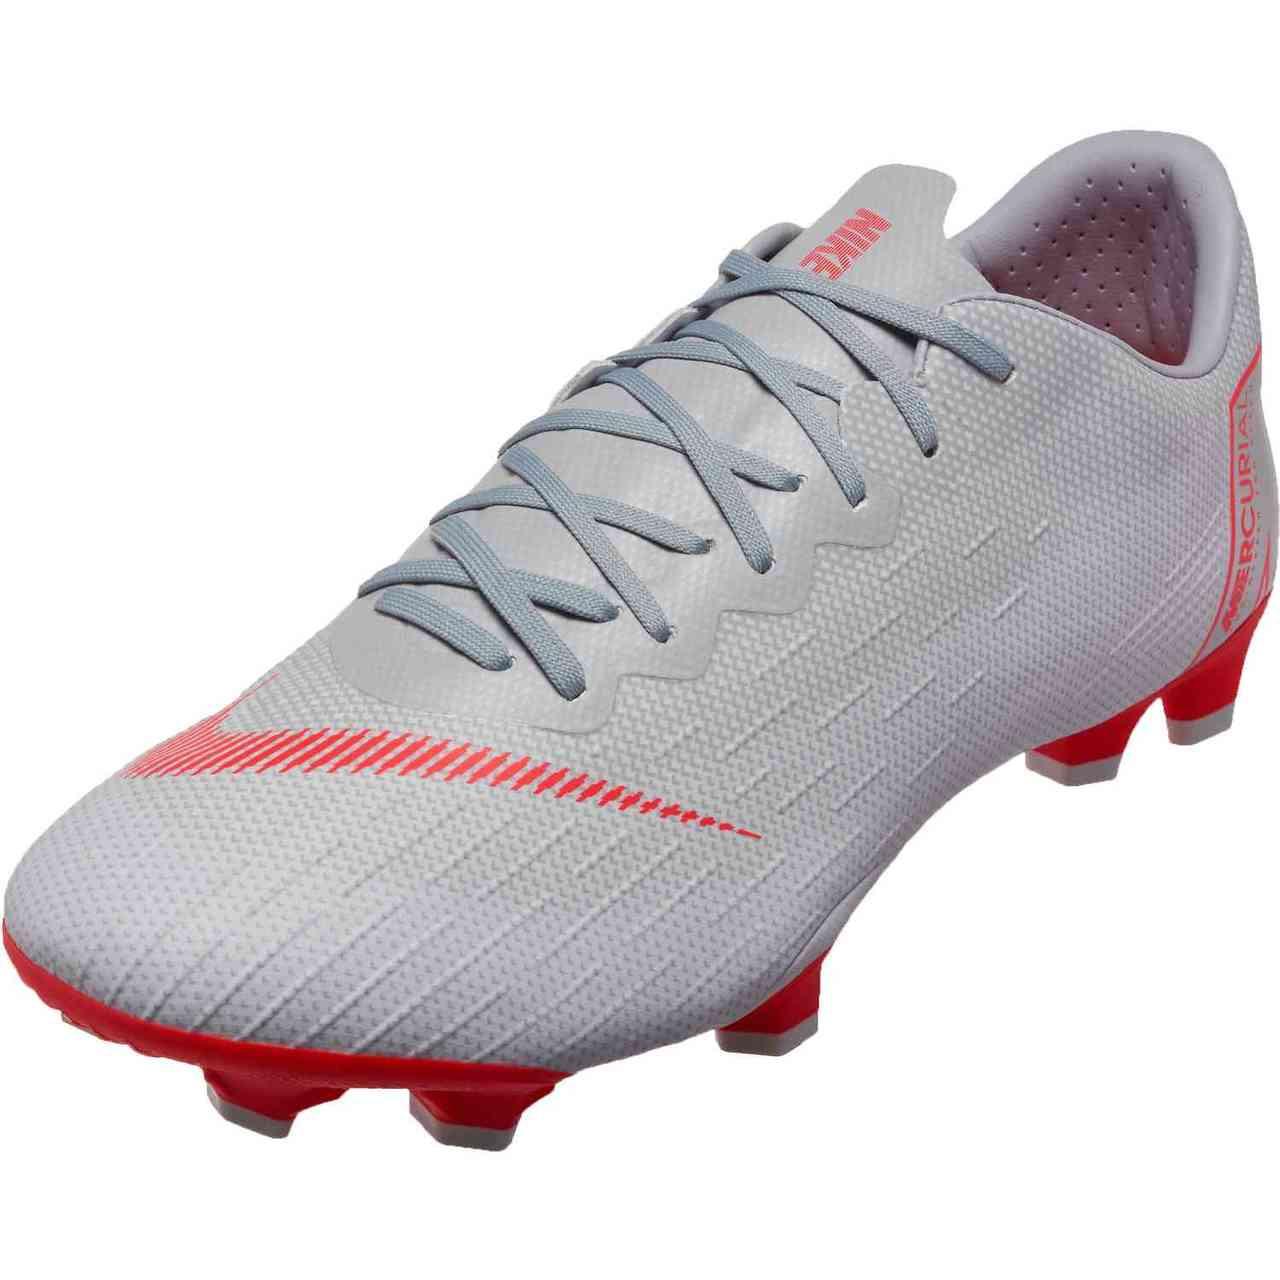 abc39b11399 Nike Vapor 12 Pro FG - Wolf Grey/Light Crimson SD (052519)